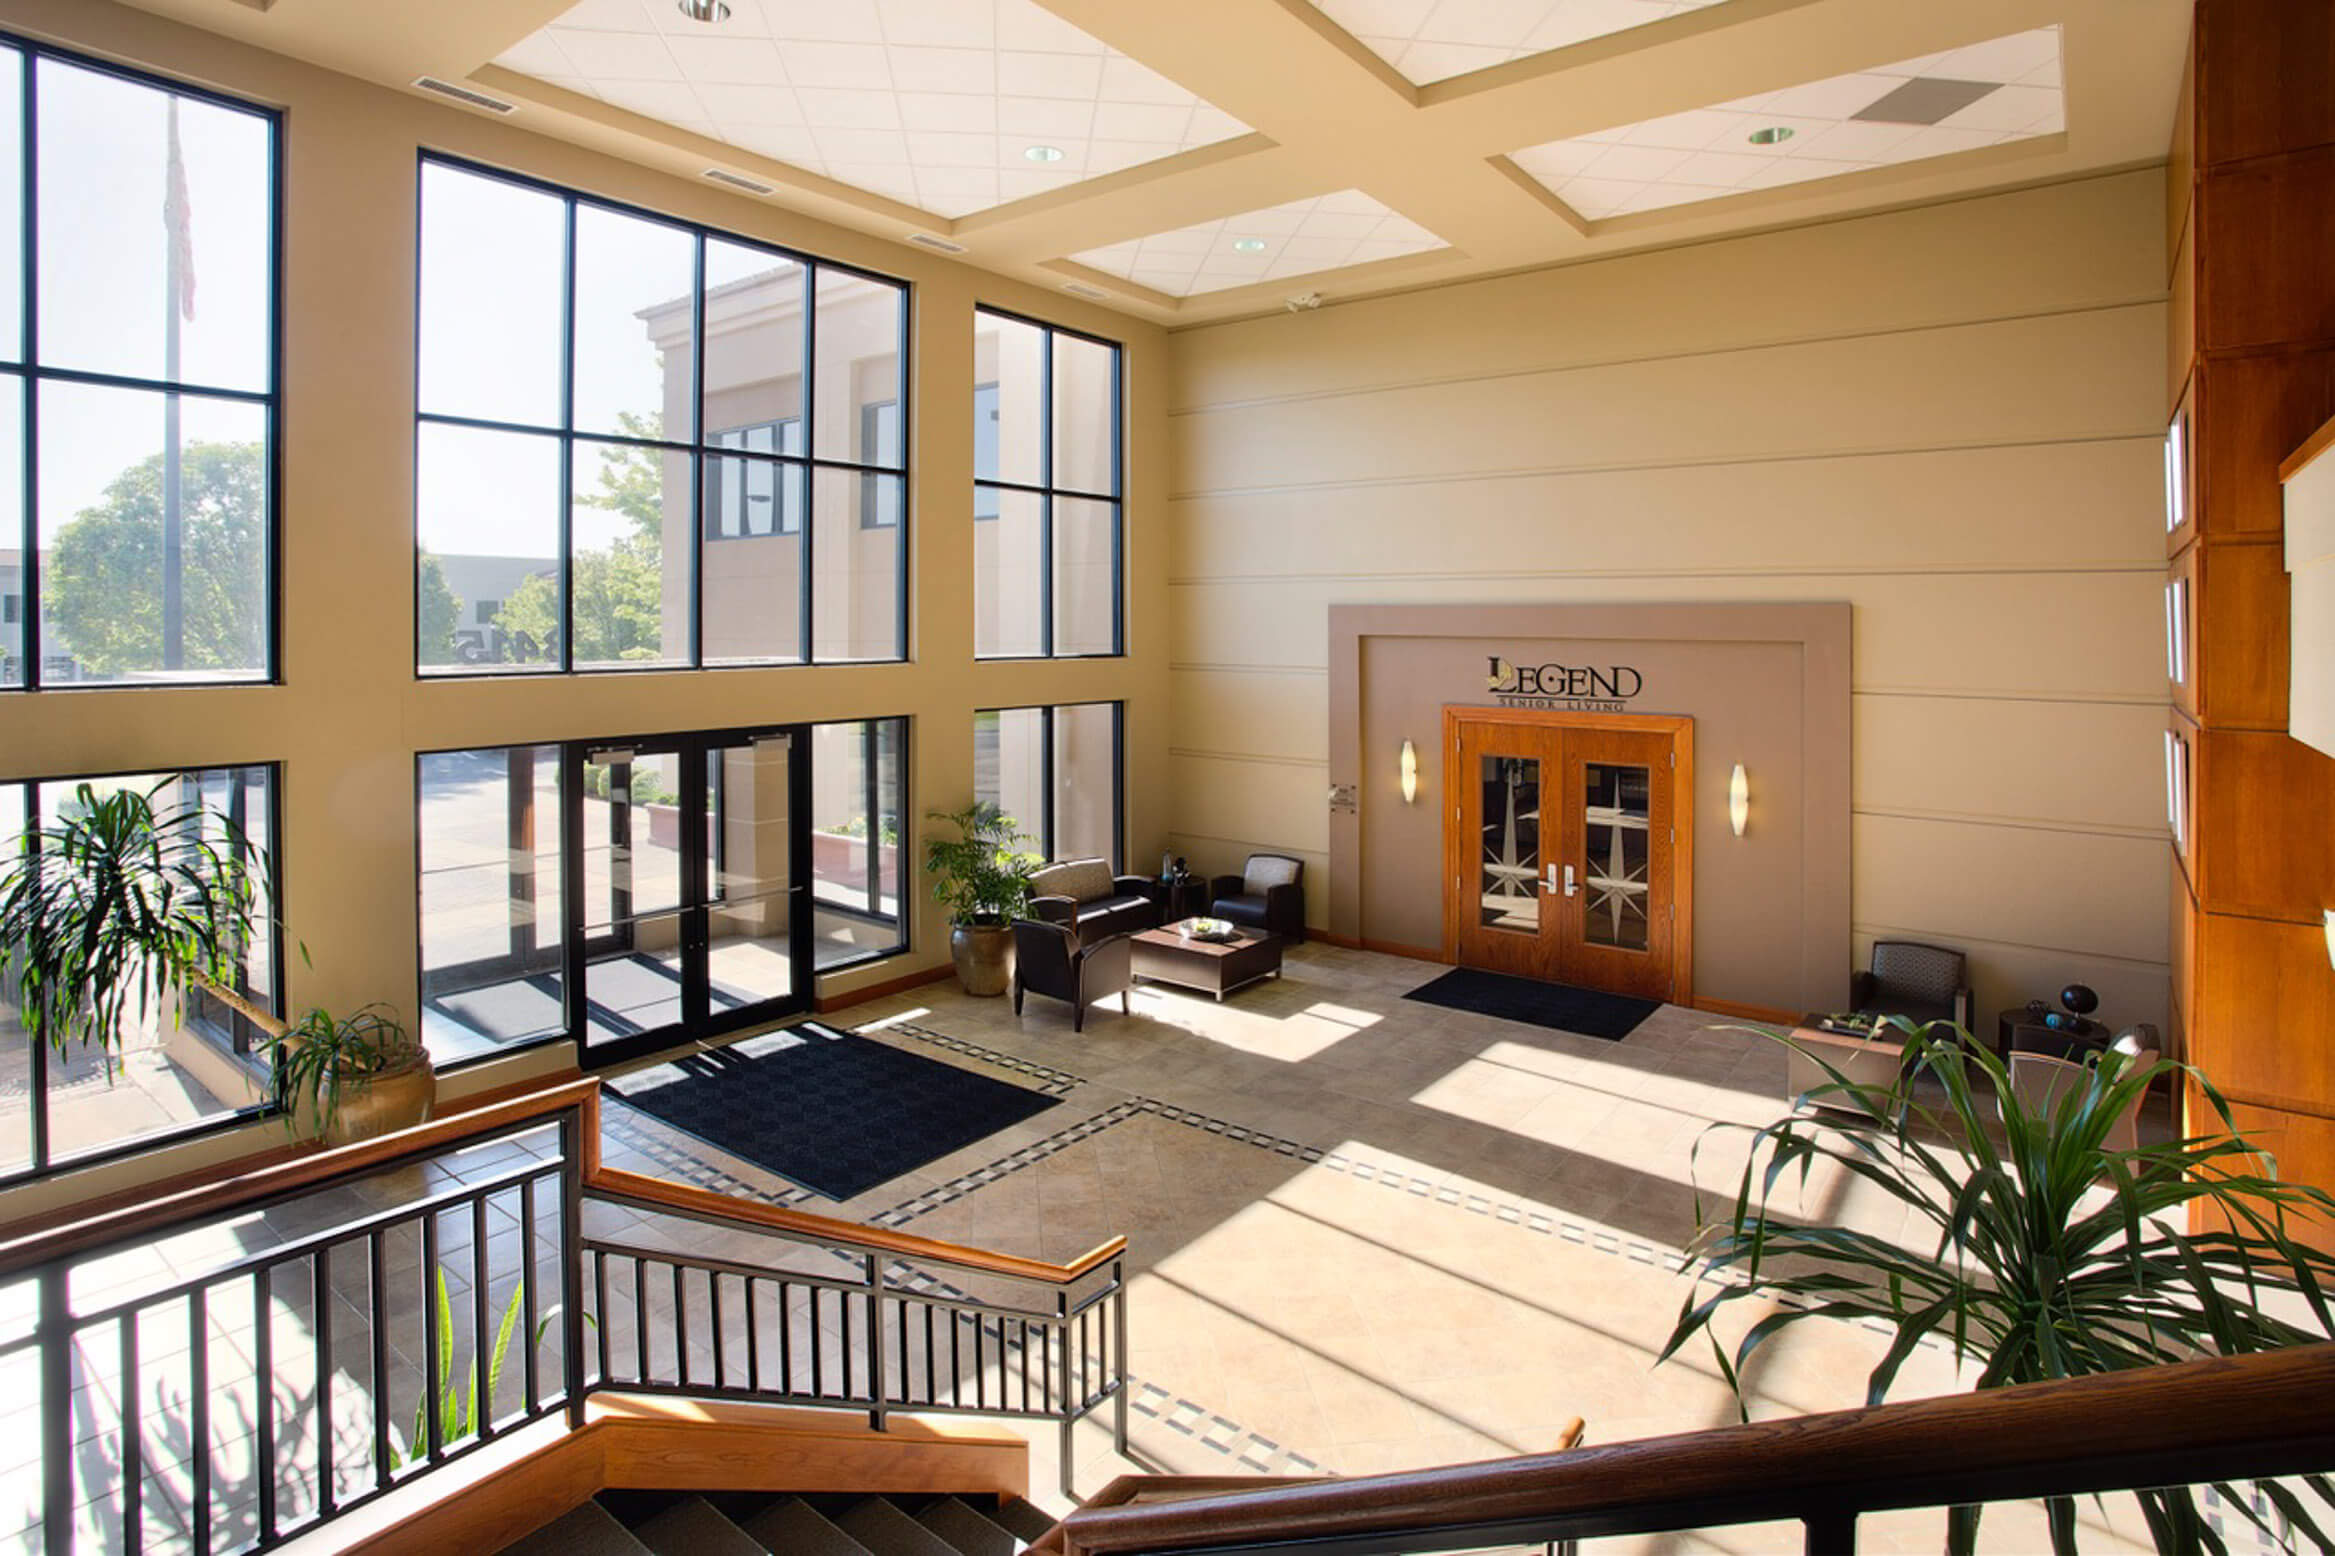 vantage-point-properties-wichita-kansas-real-estate-wilson